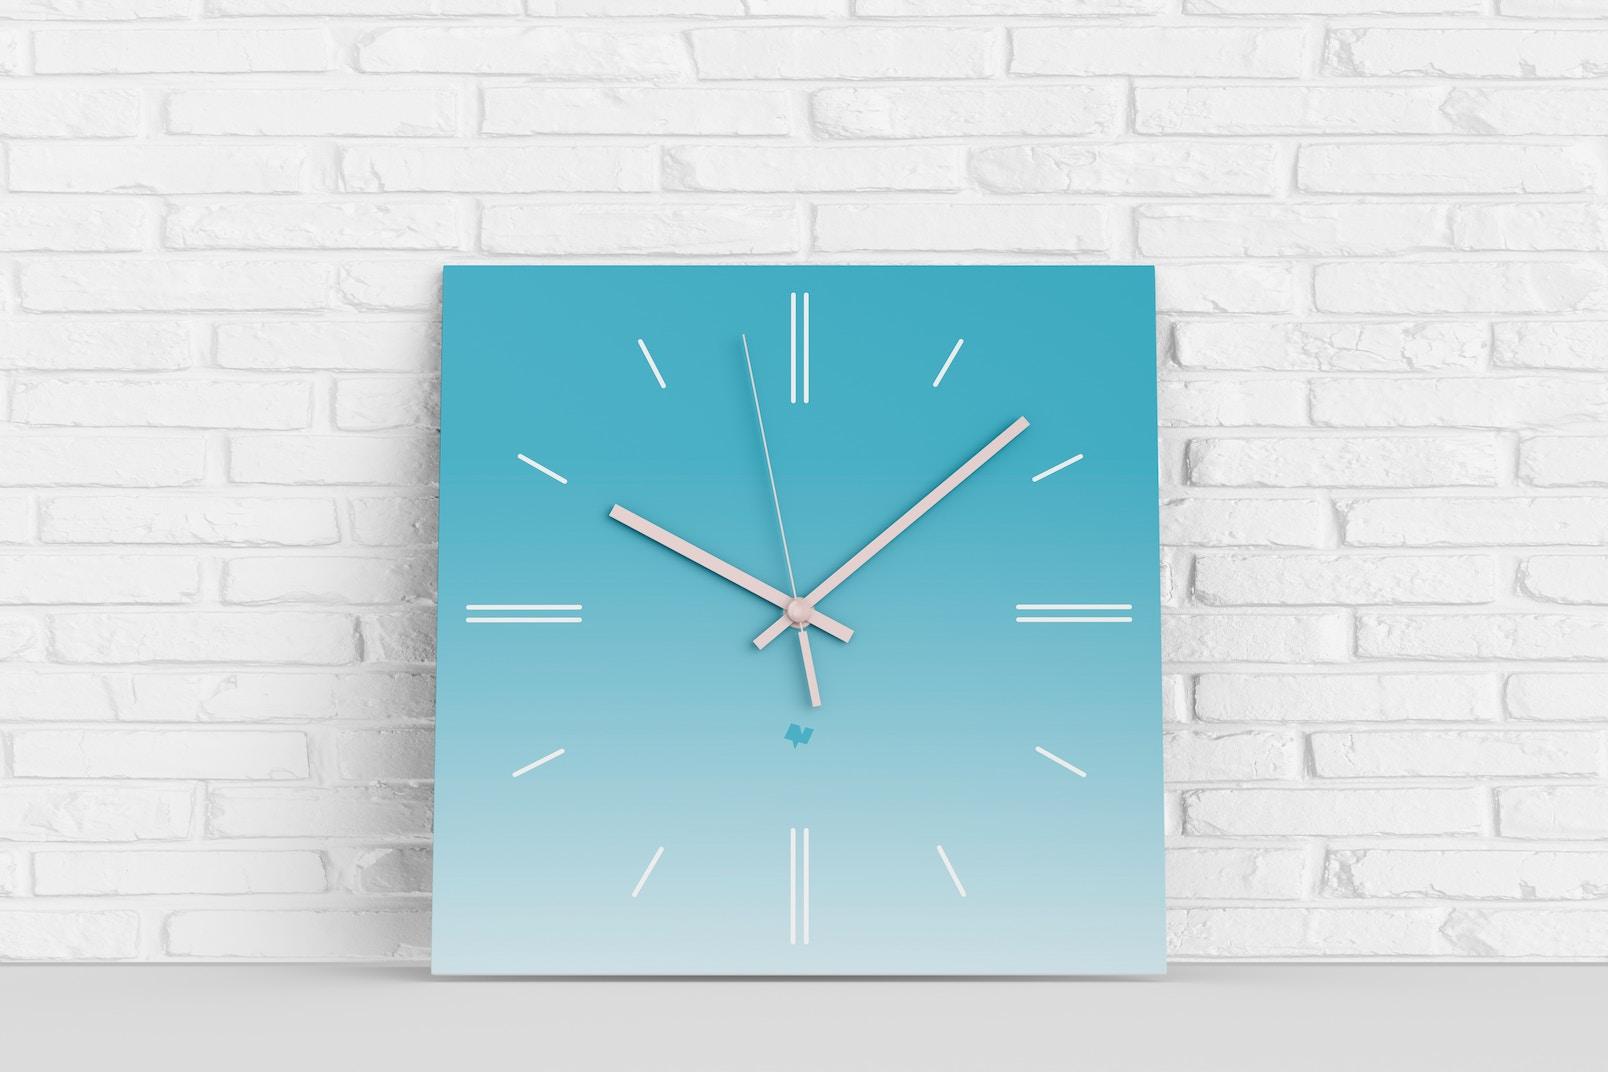 Maqueta de Reloj de Pared Cuadrado, Inclinado